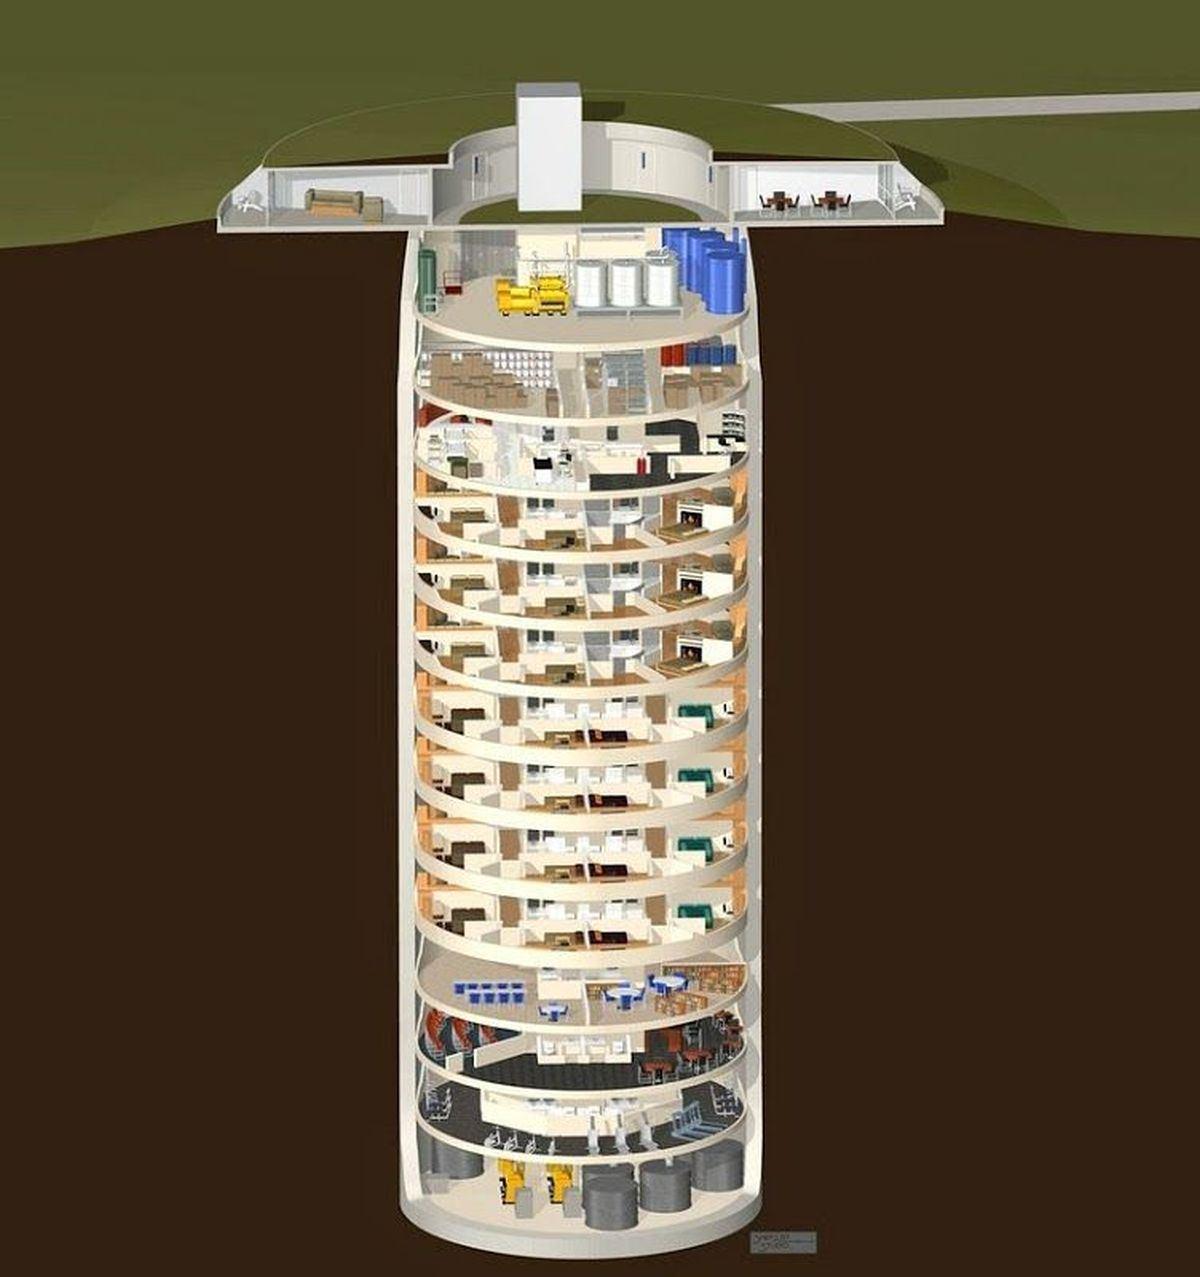 Bunker sotterraneo